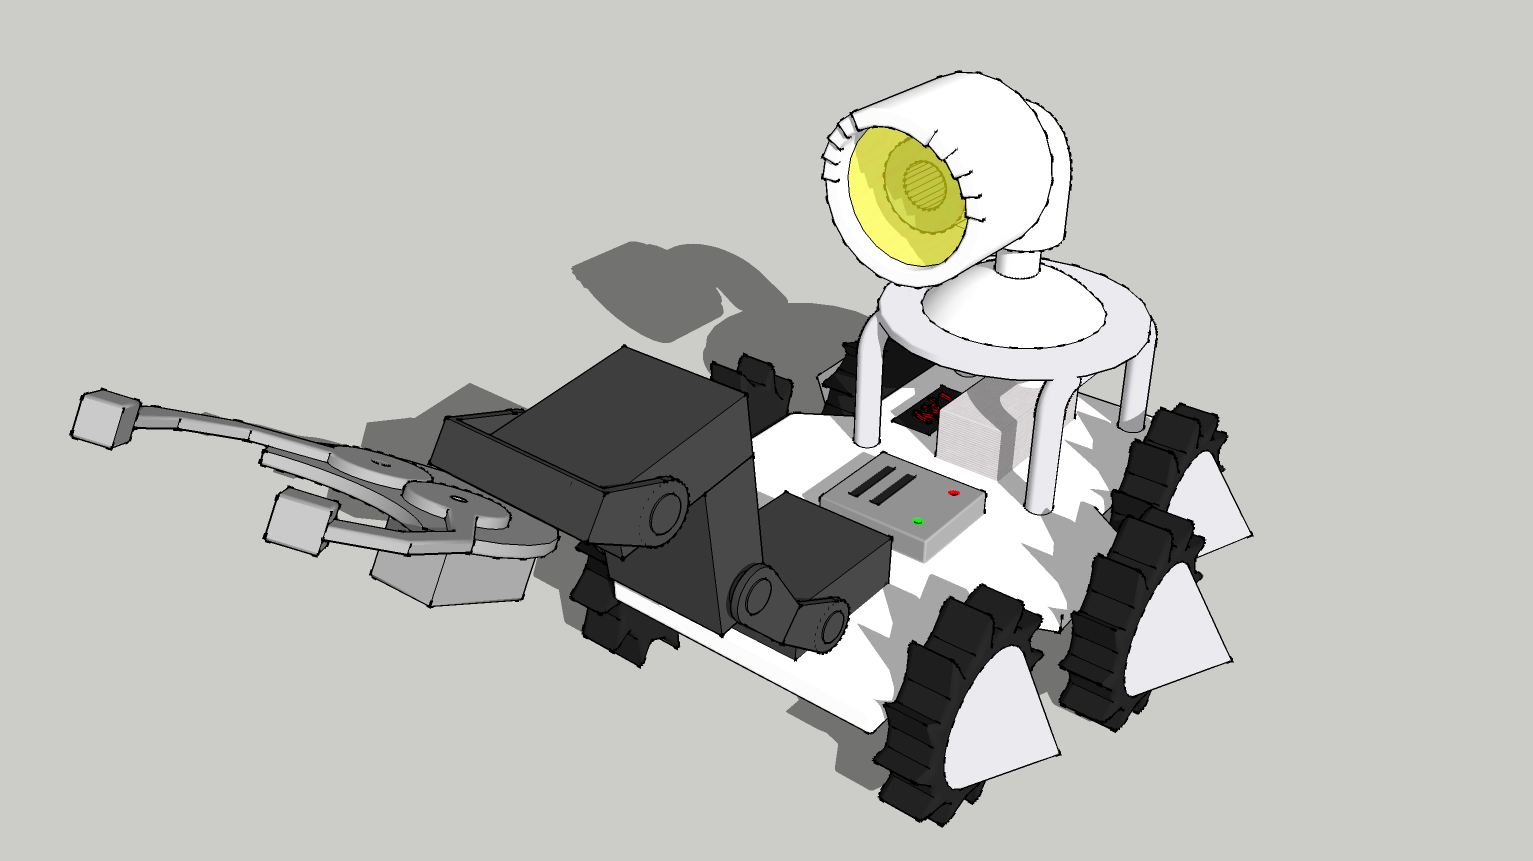 ROBOT WOŚP